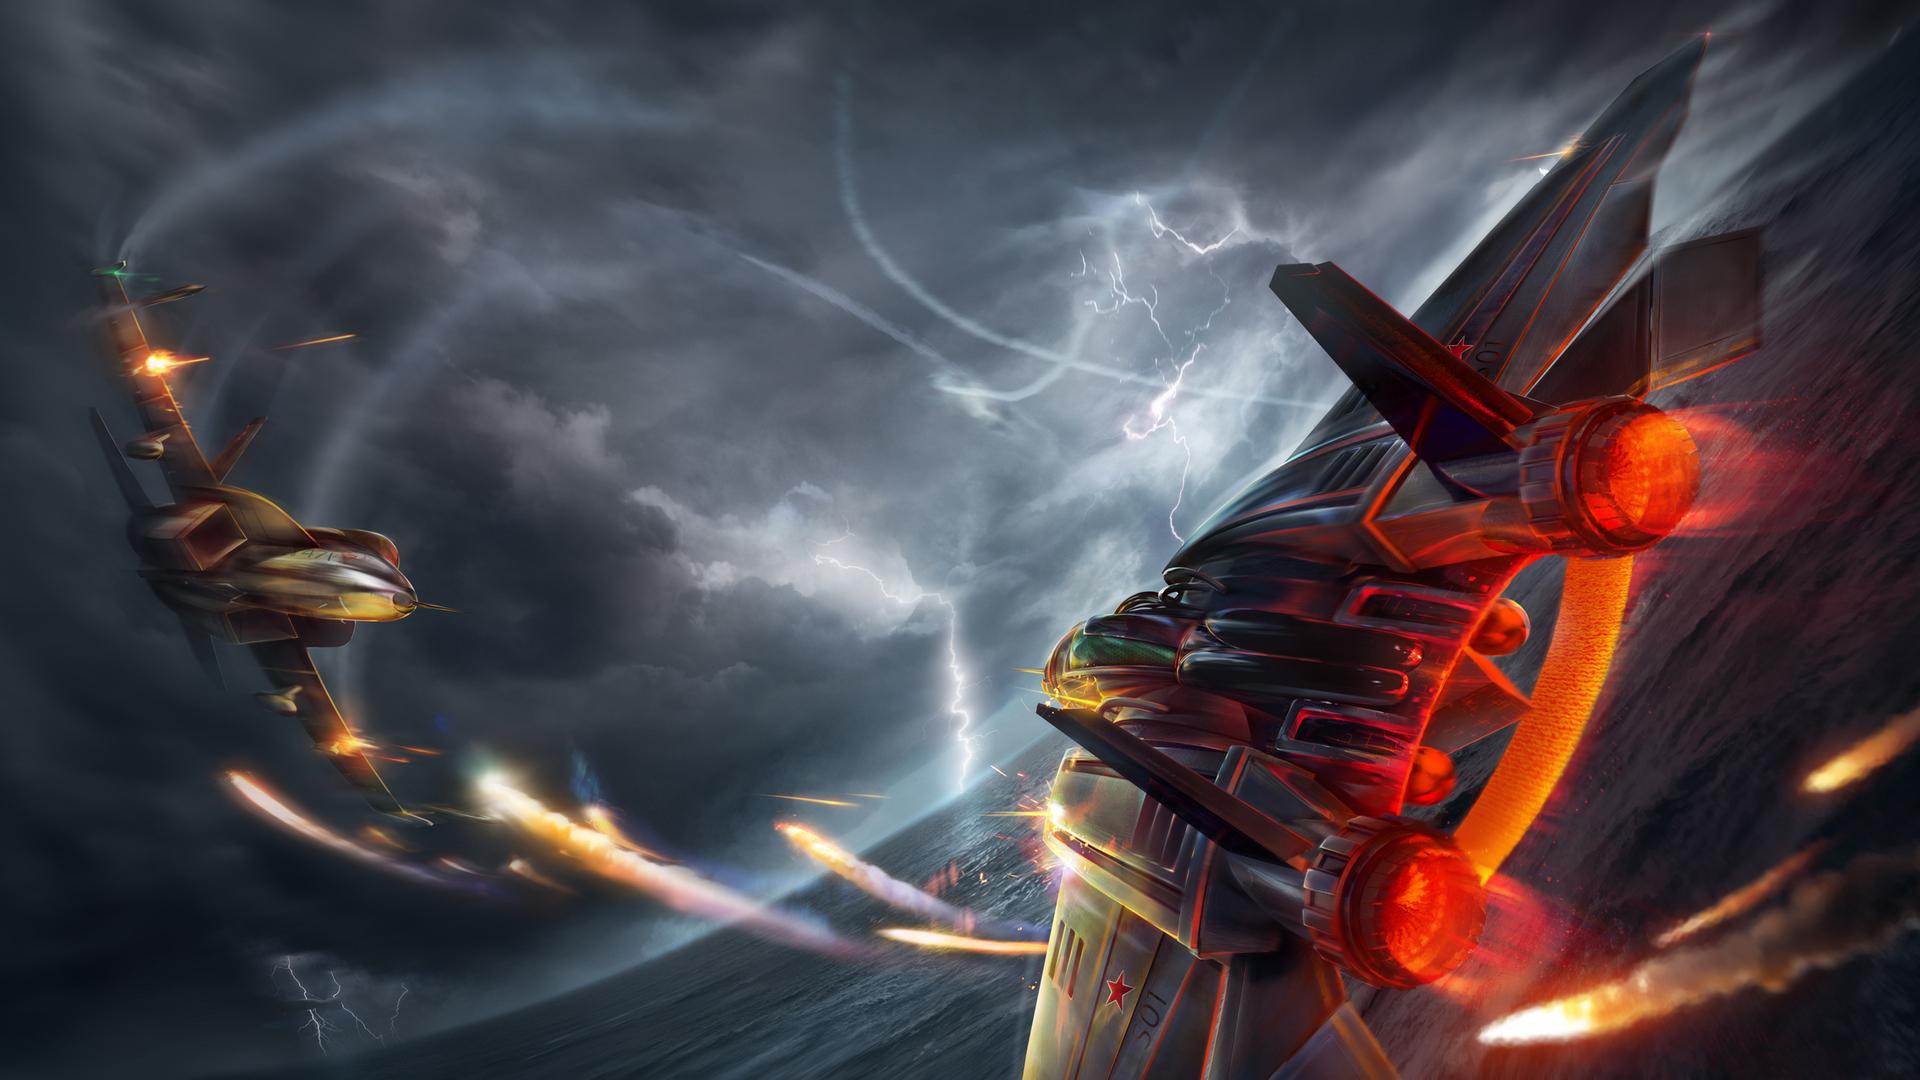 airplane-attack-aviation-artwork-v3.jpg